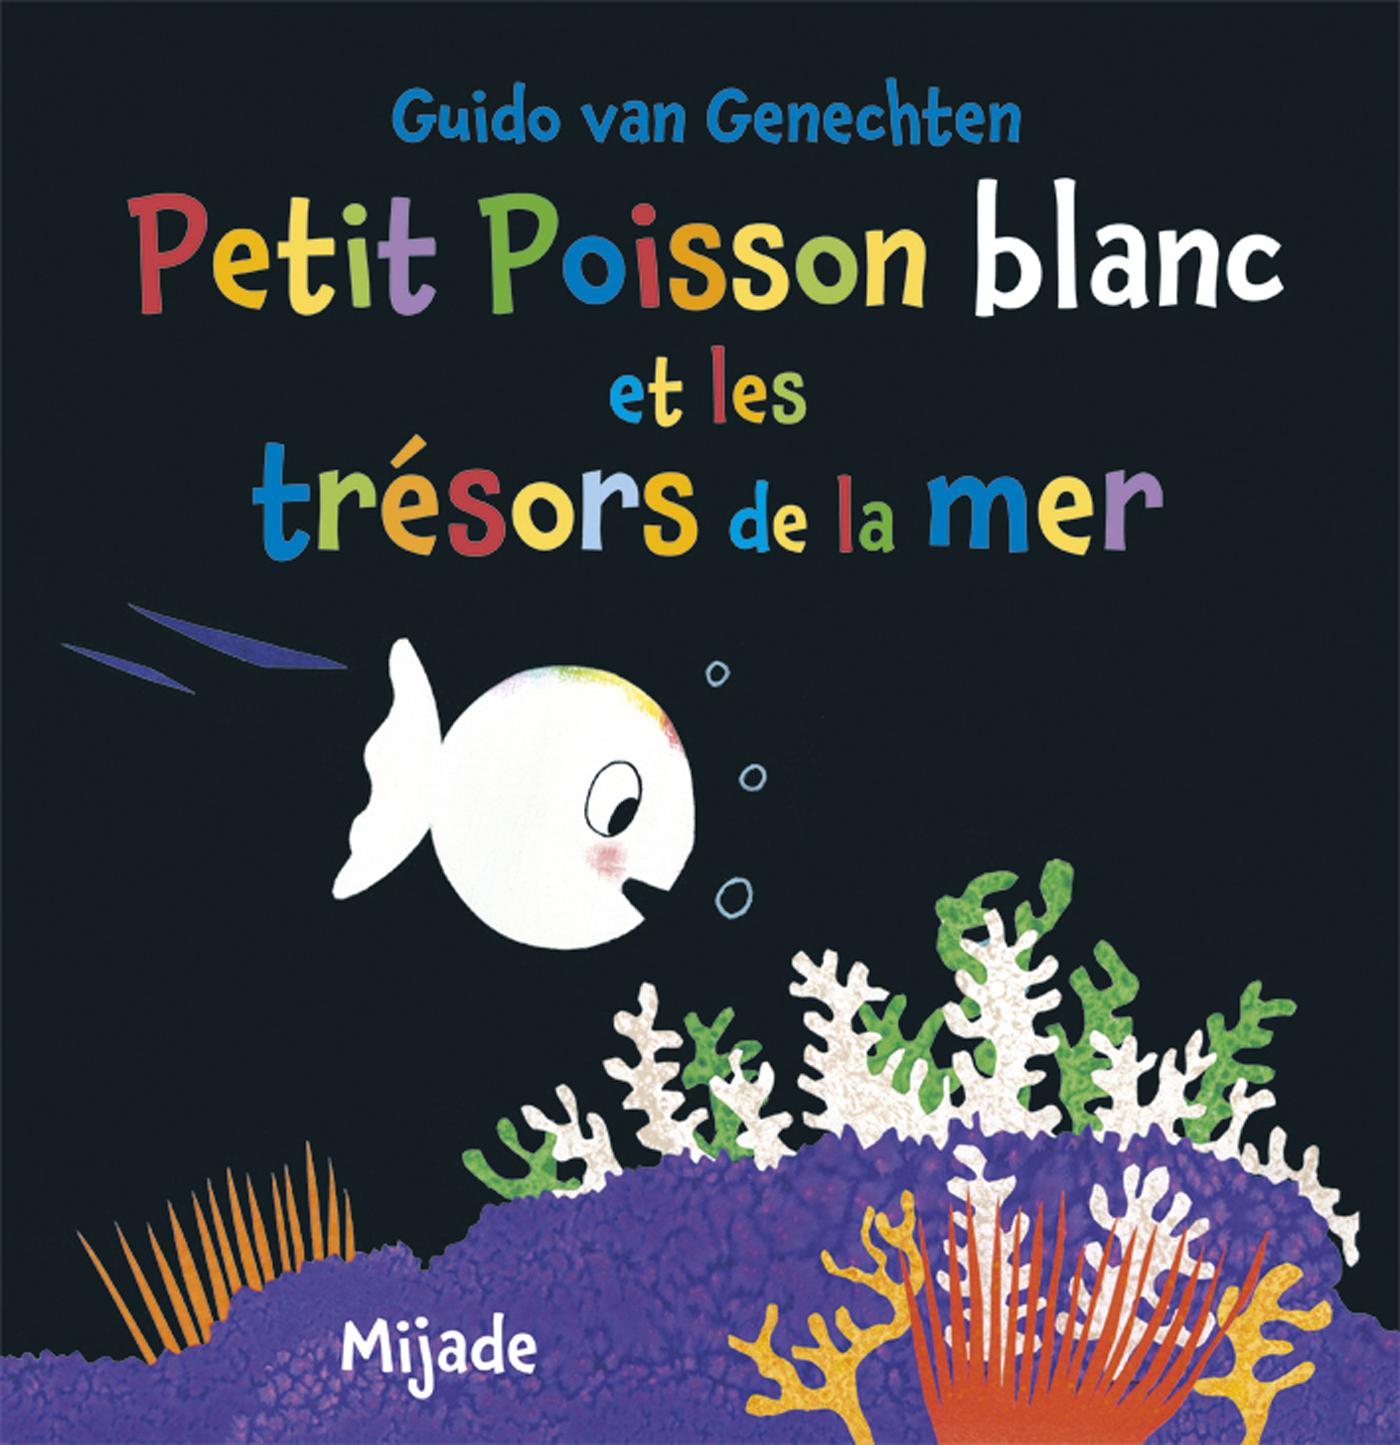 PETIT POISSON BLANC ET LES TRESORS DE LA MER